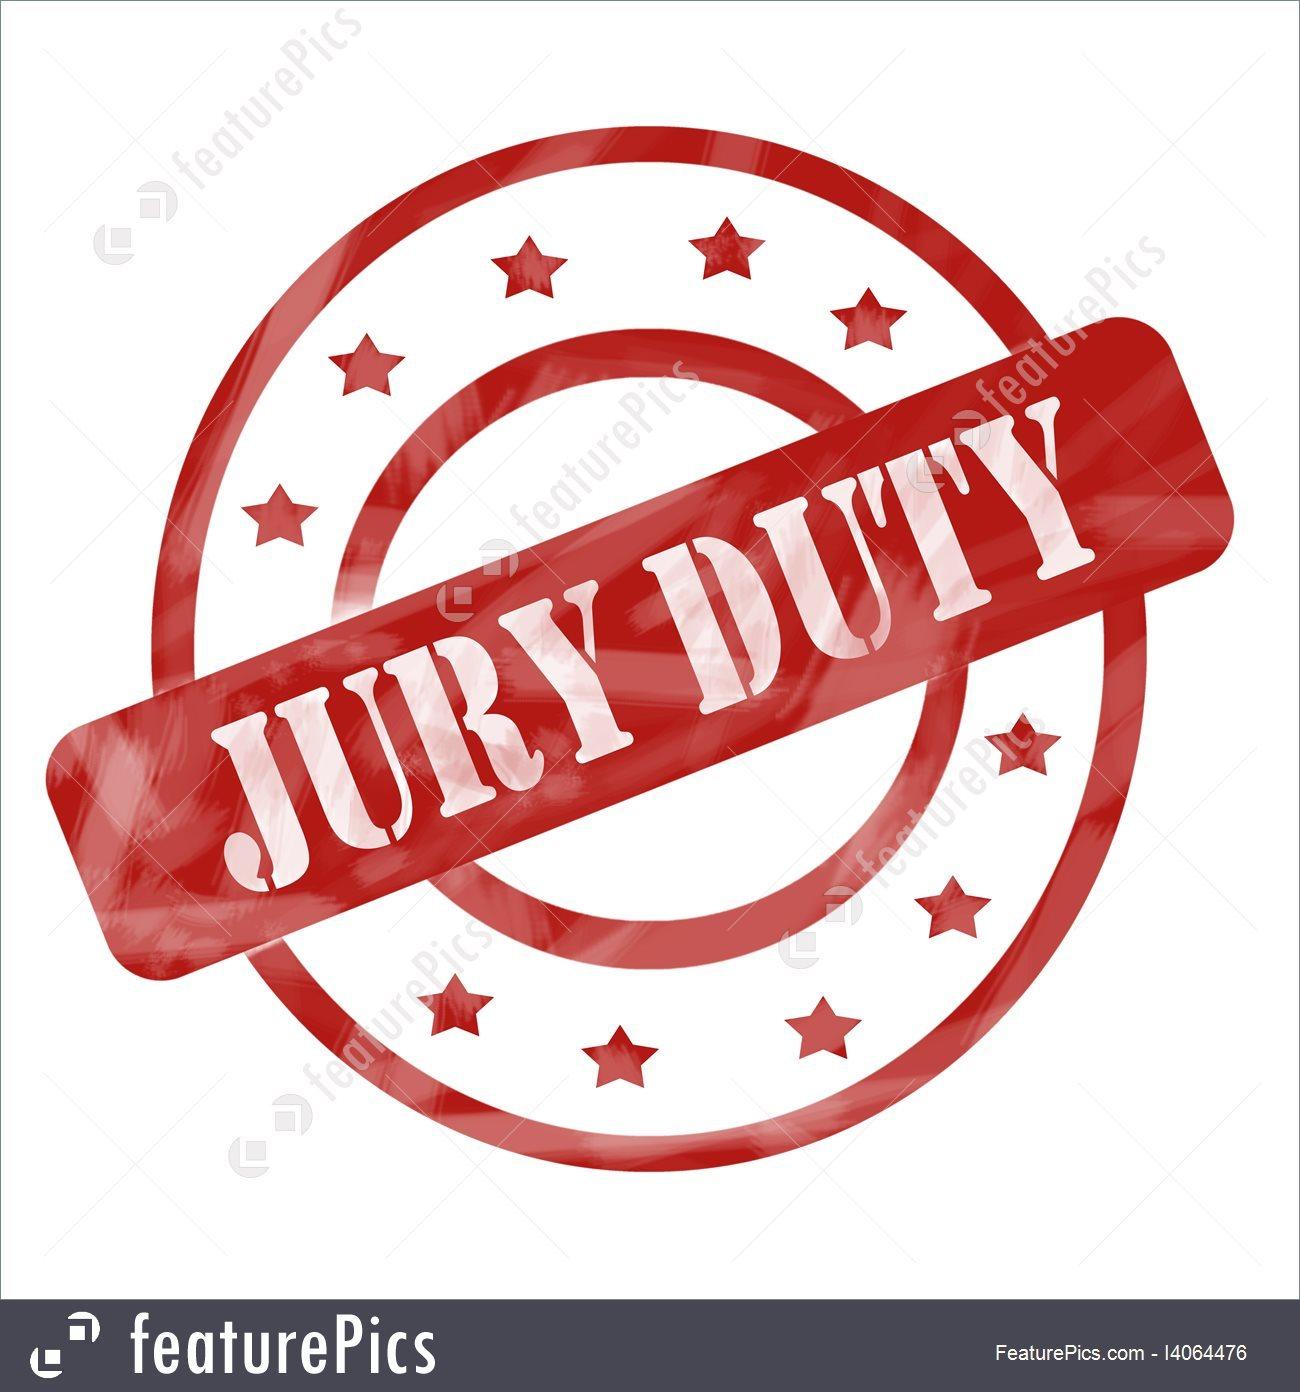 Jury duty clipart 7 » Clipart Portal.